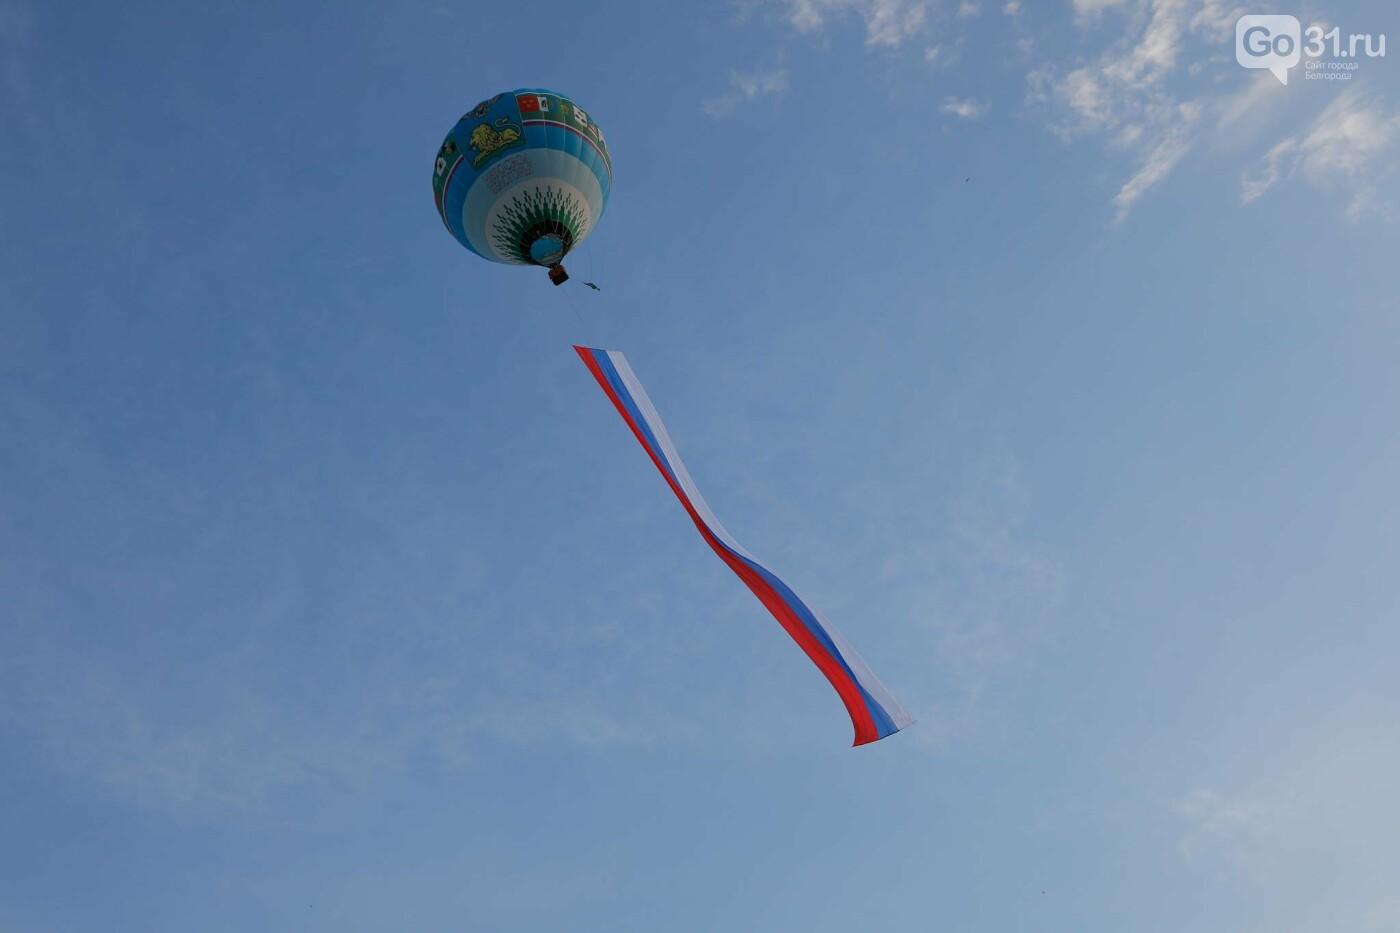 Над Белгородом пролетел аэростат с гигантским триколором, фото-24, Фото: Антон Вергун